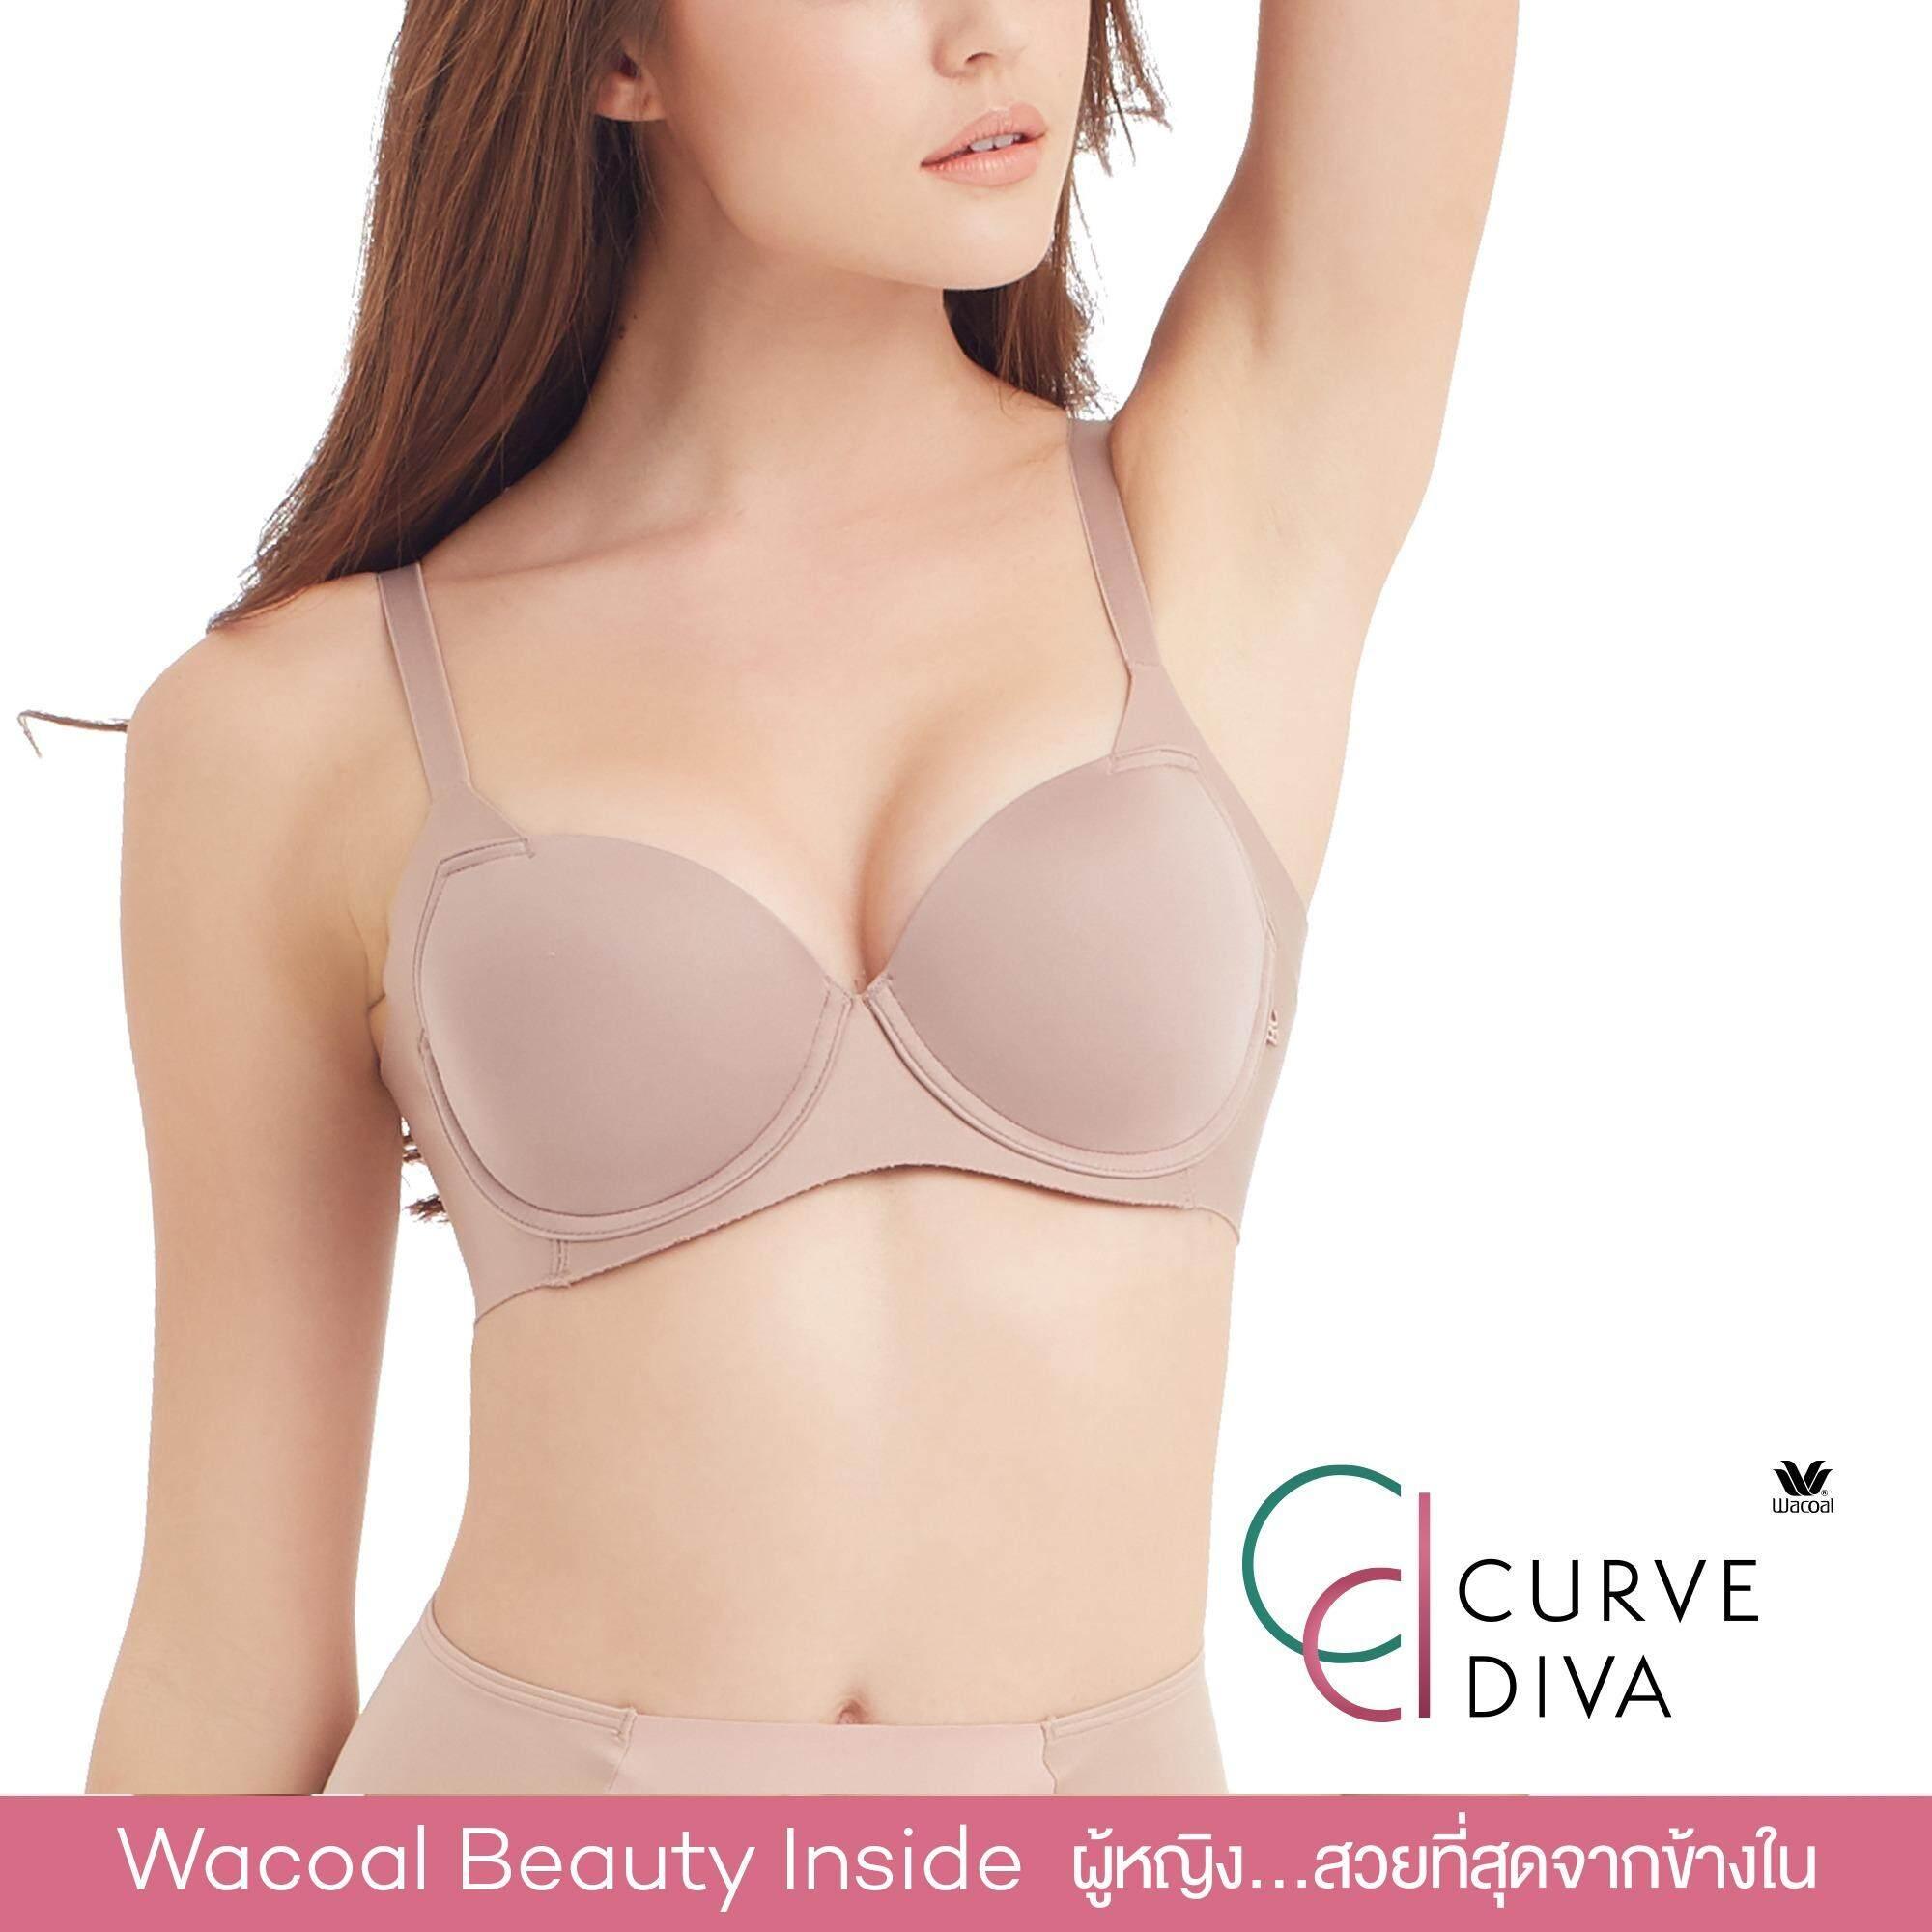 Wacoal Curve Diva Seamless bra 4/5 Cup (สีโอวัลติน/OVALTINE) - WB7914OT